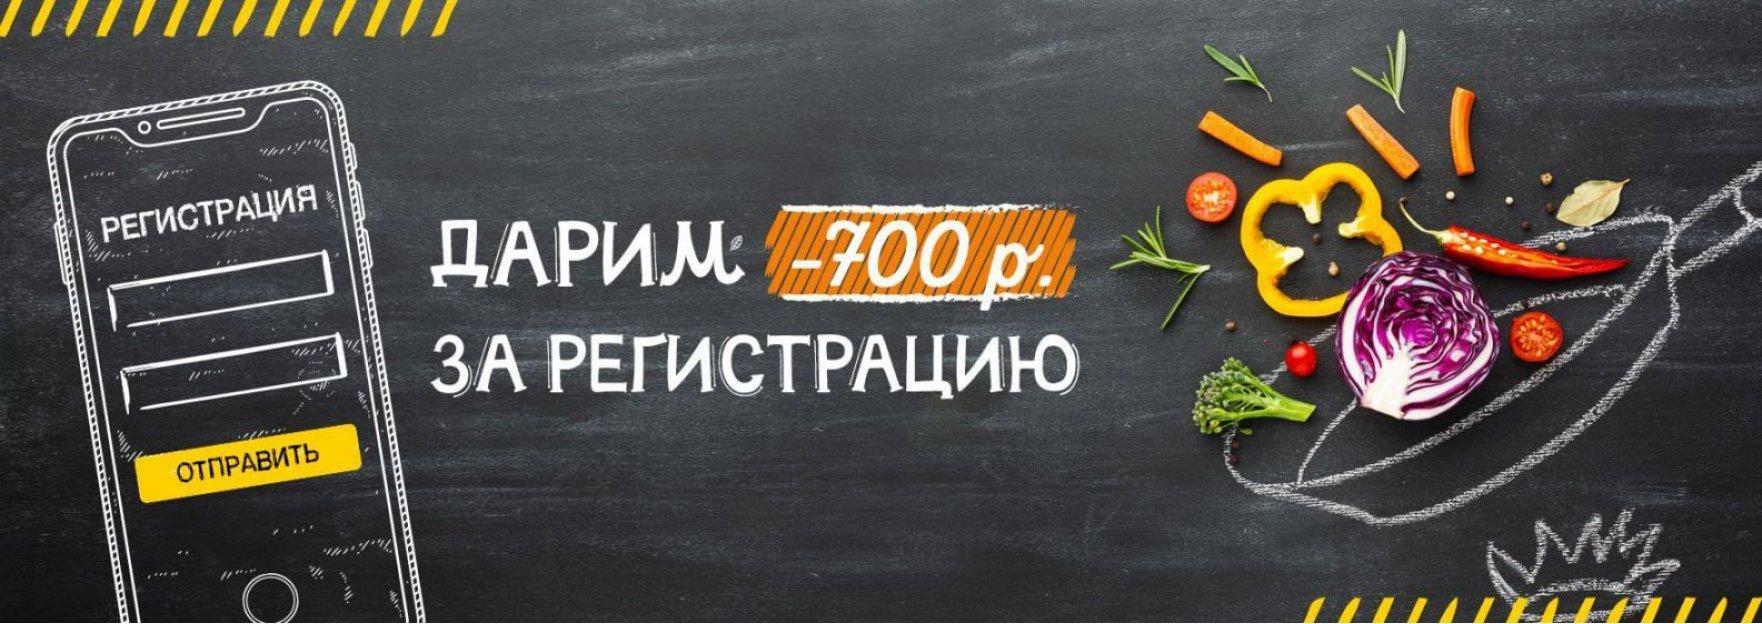 500 р за регистрацию на сайте